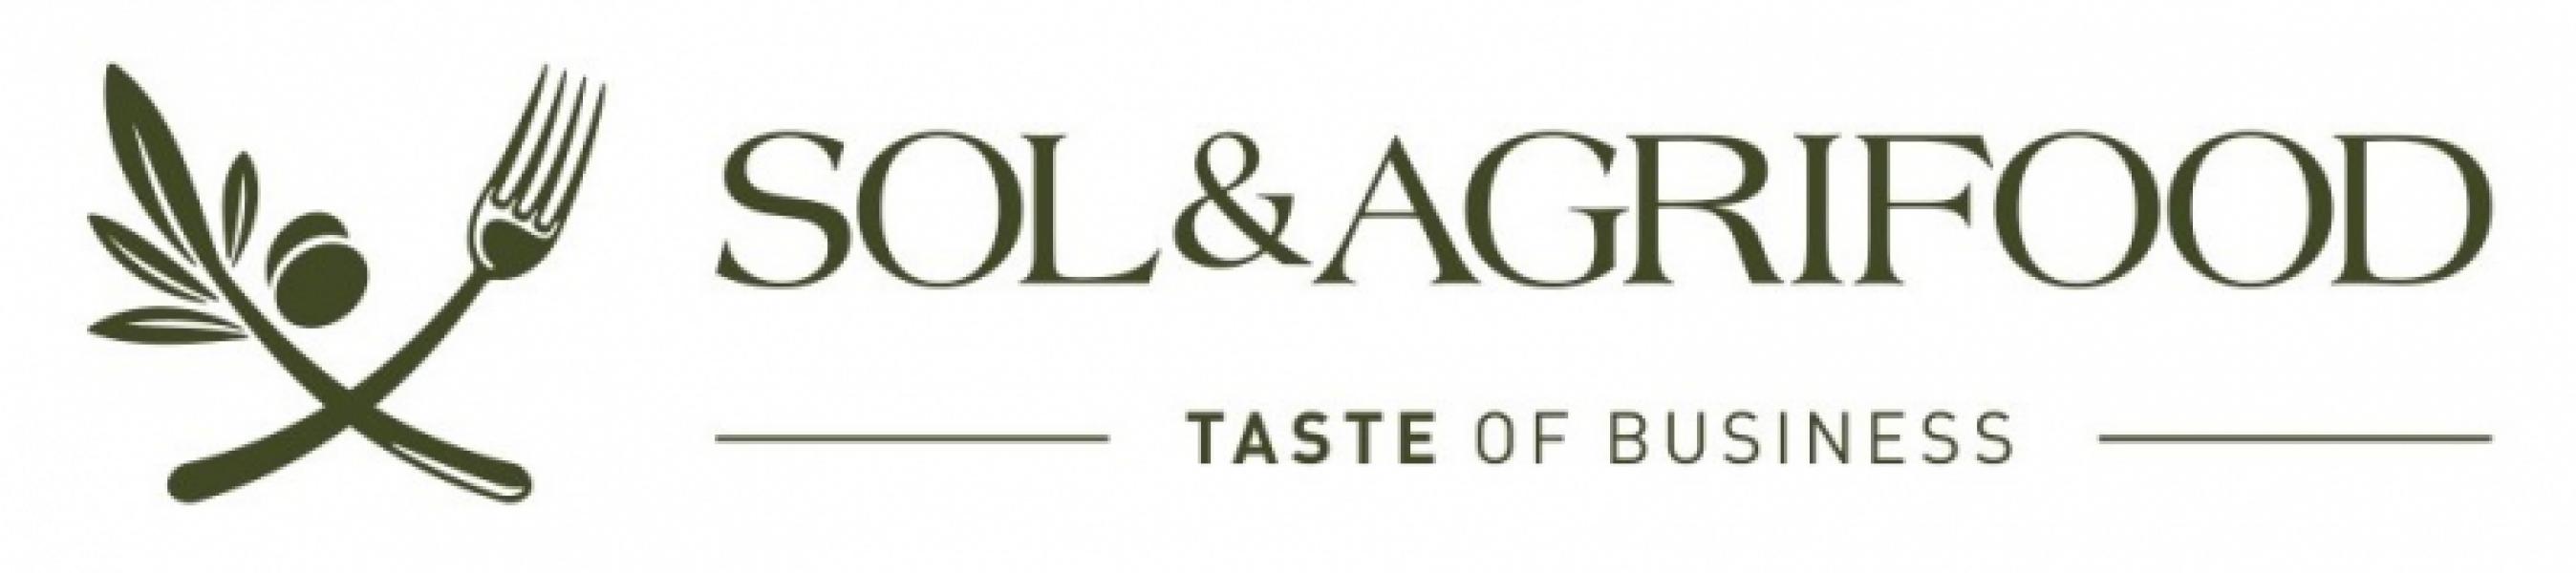 Logotipo de Sol&Agri Food